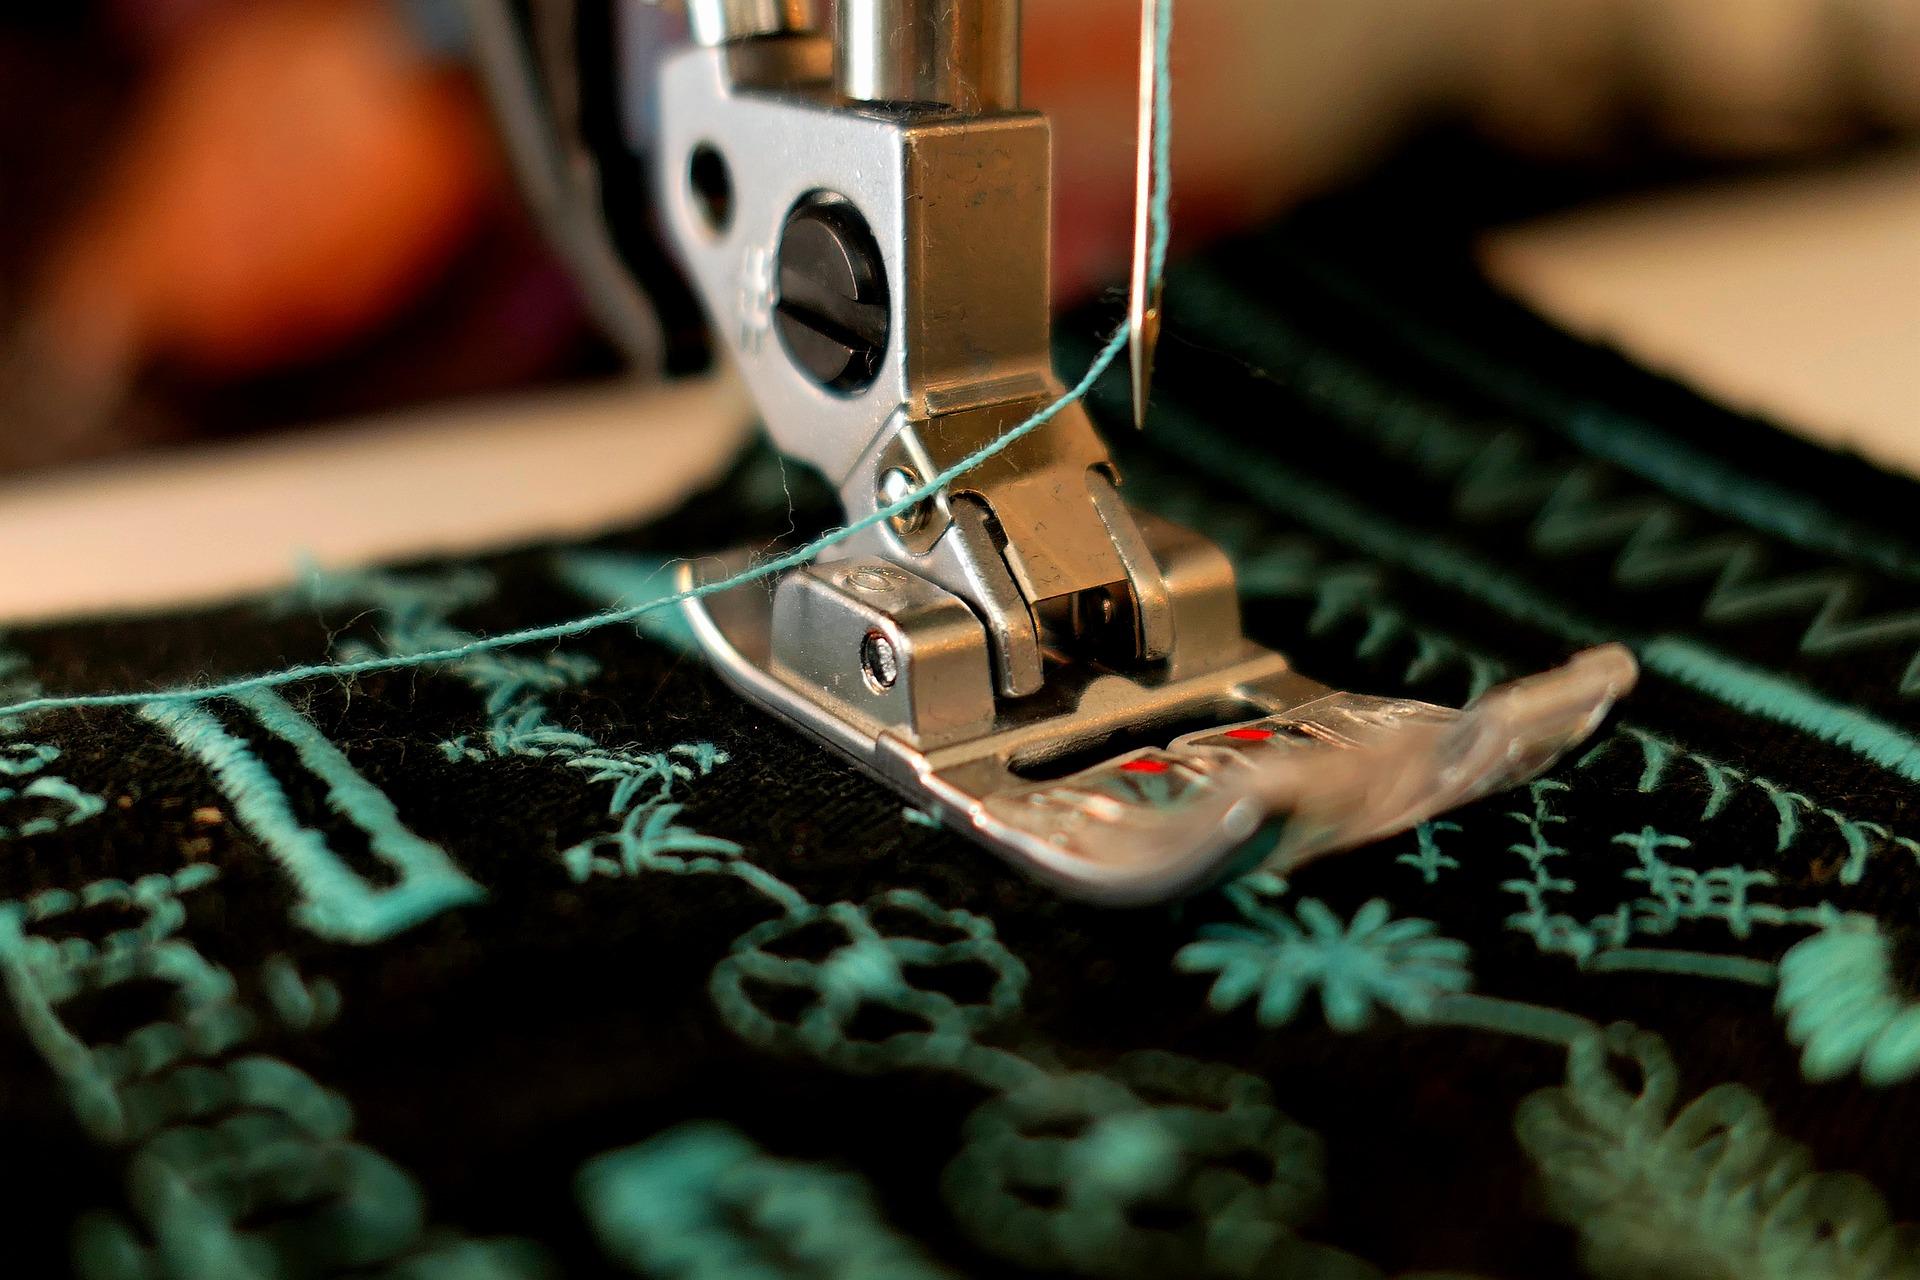 Lockmachine of reguliere naaimachine, welke moet je kiezen?